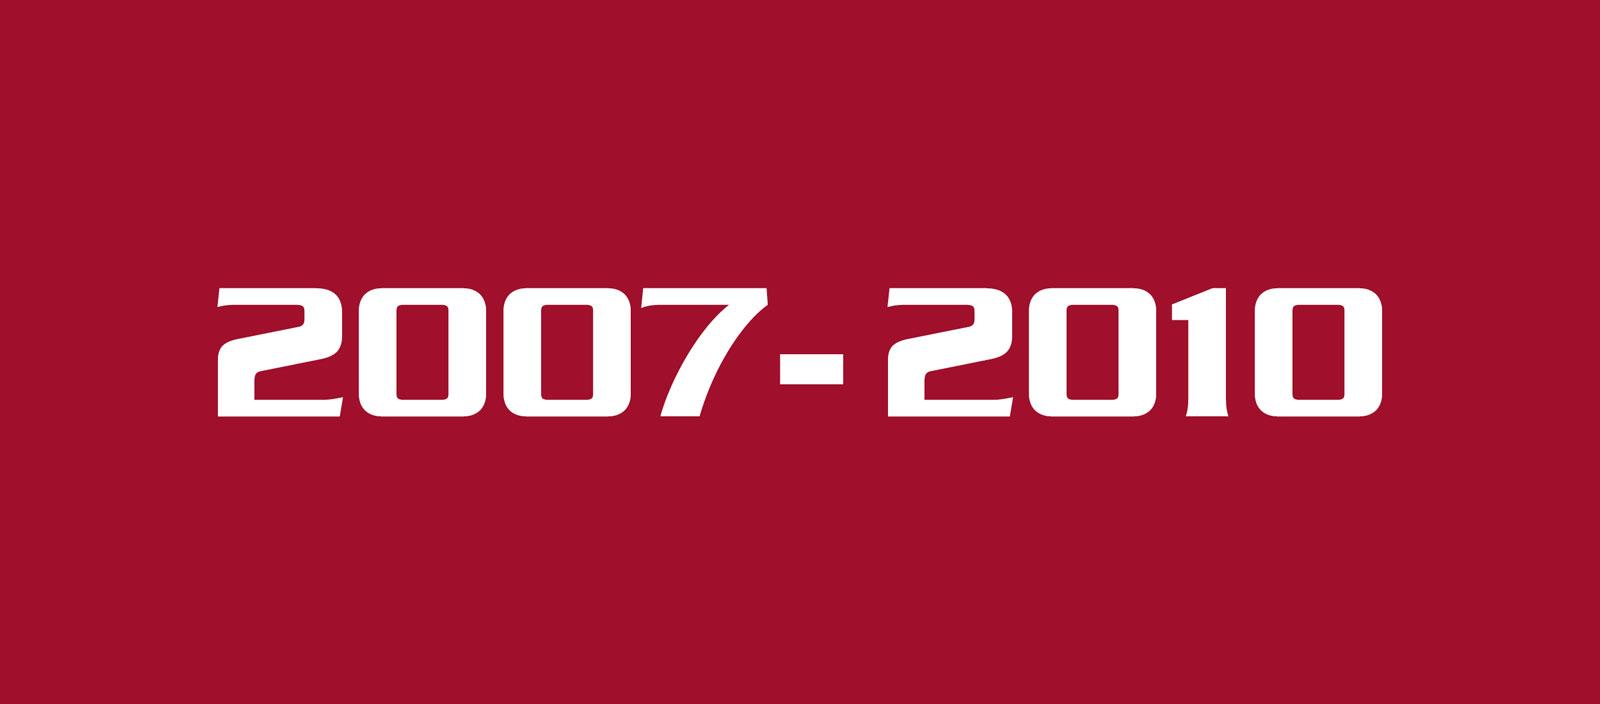 2007 2010 1